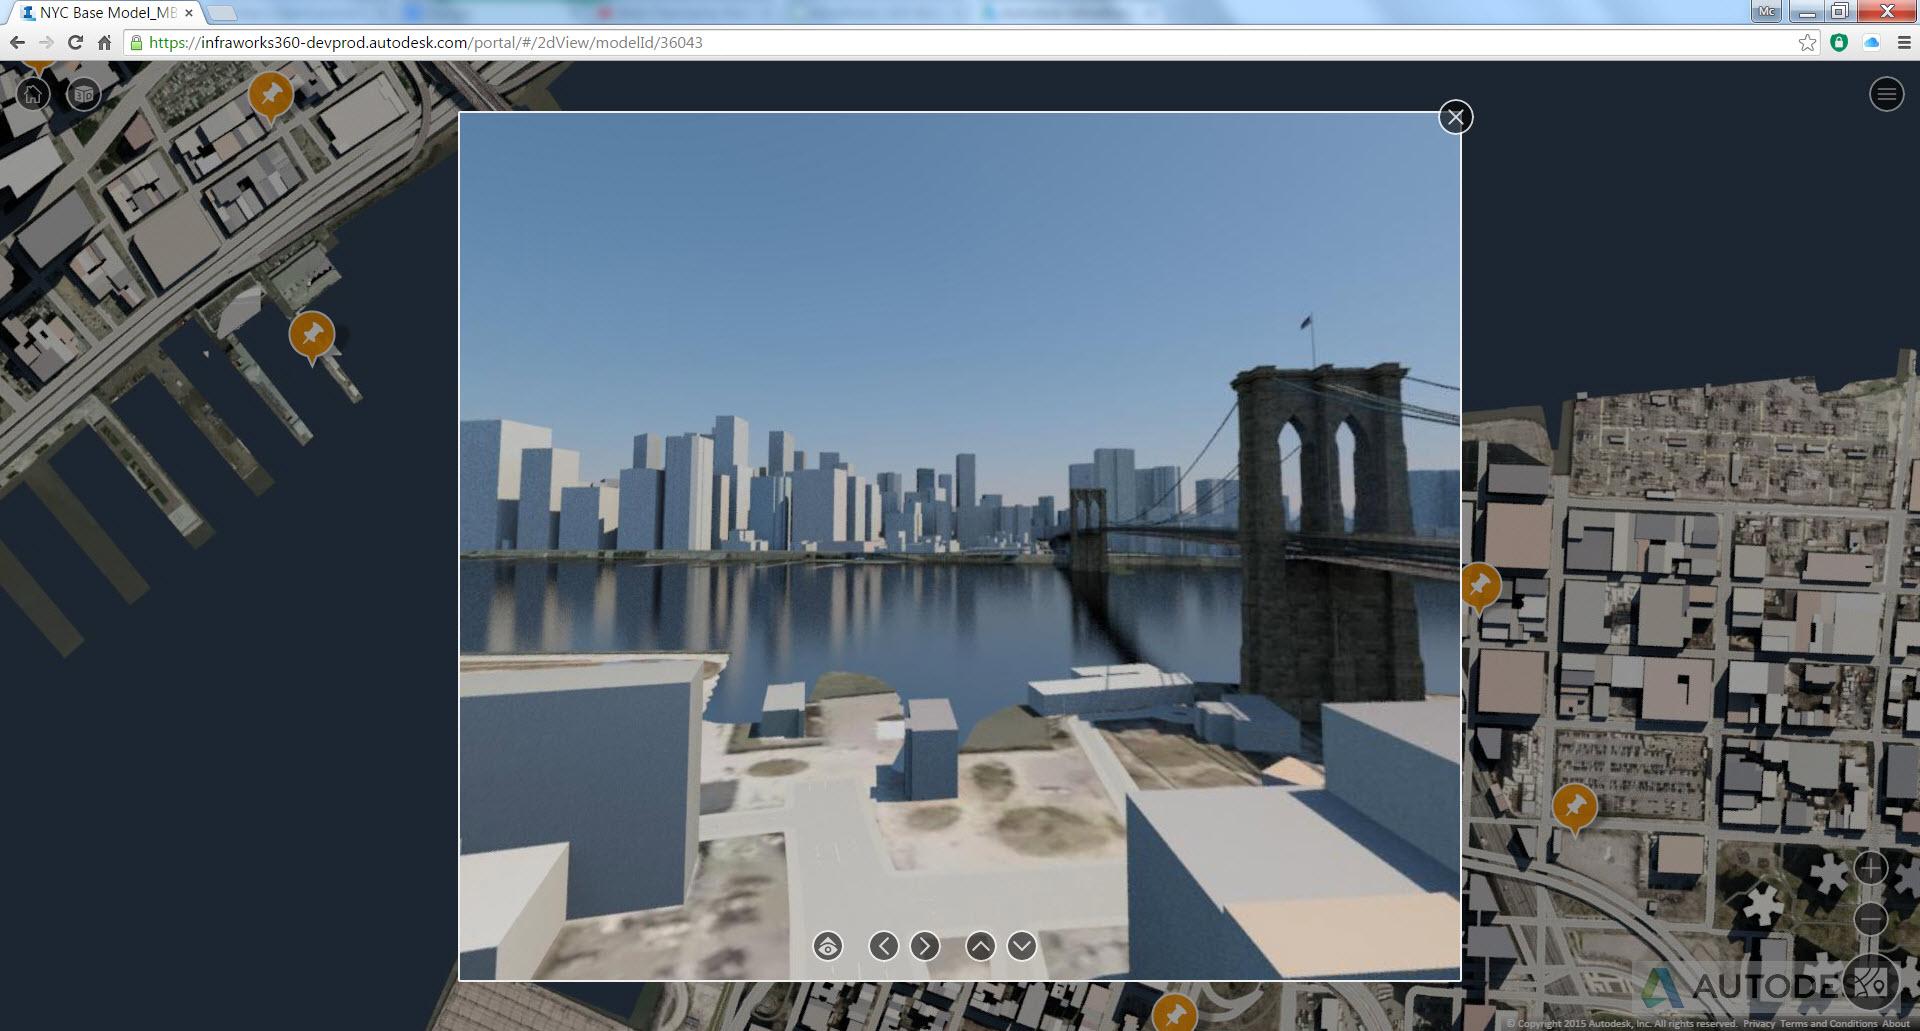 Infraworks-360-web-ny-3500-3500